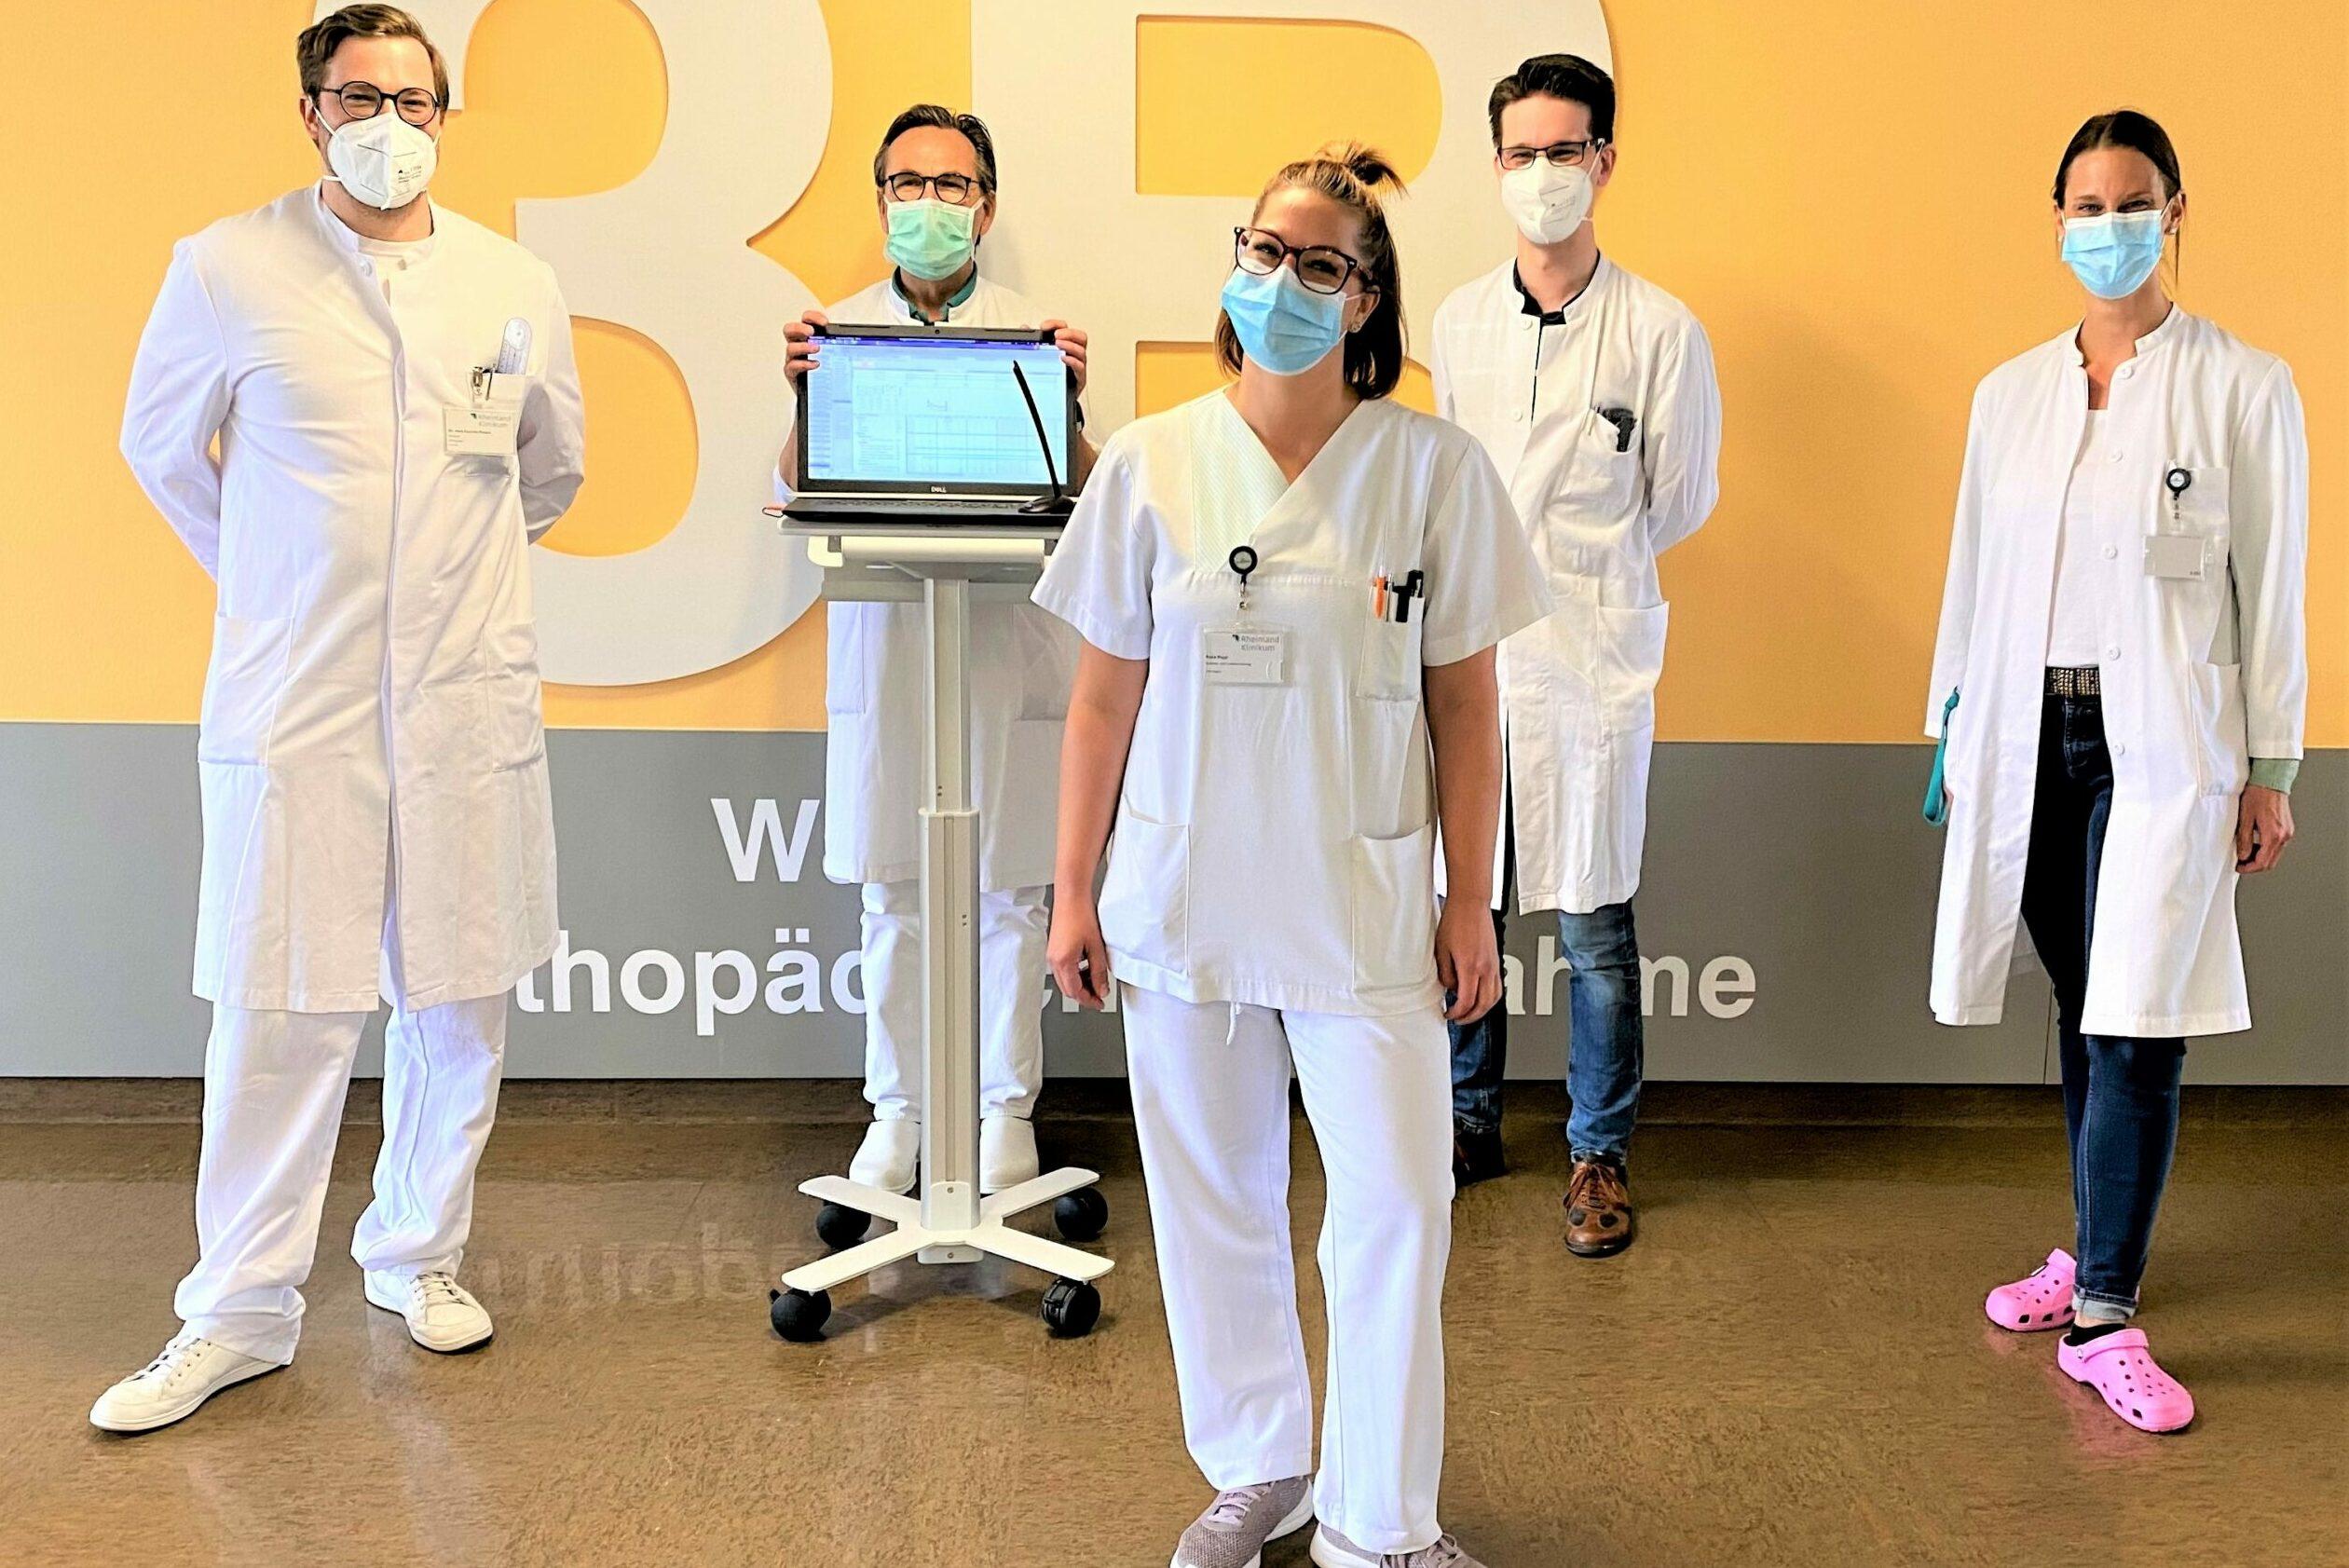 Digitale Patientenakte: Erfolgreiches Pilotprojekt